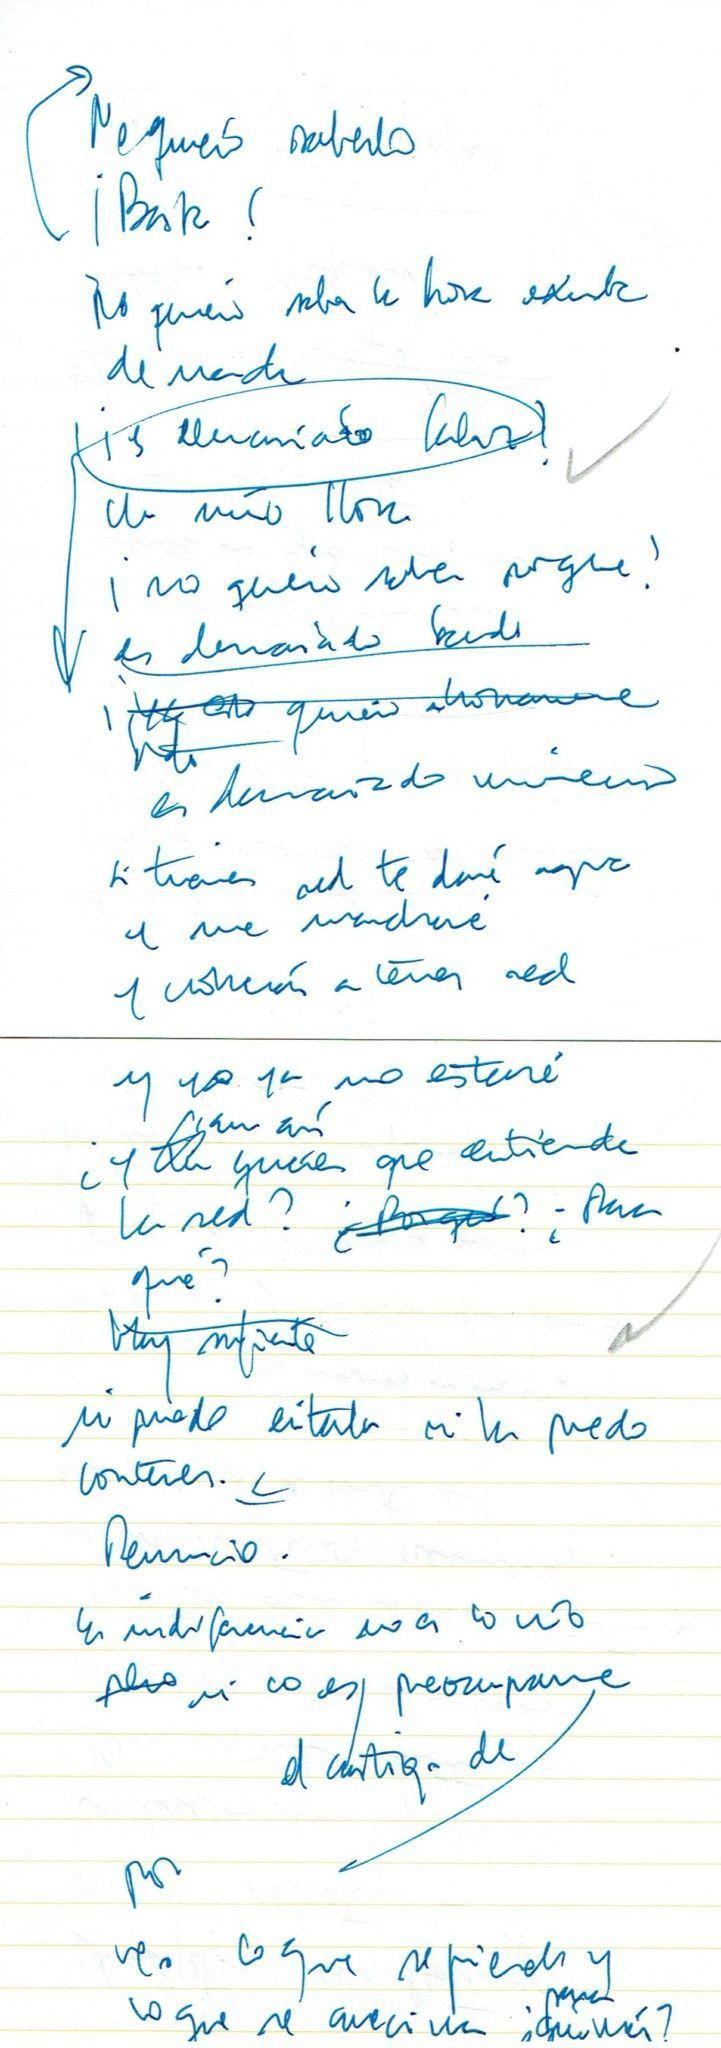 Texto manuscrito nº 32